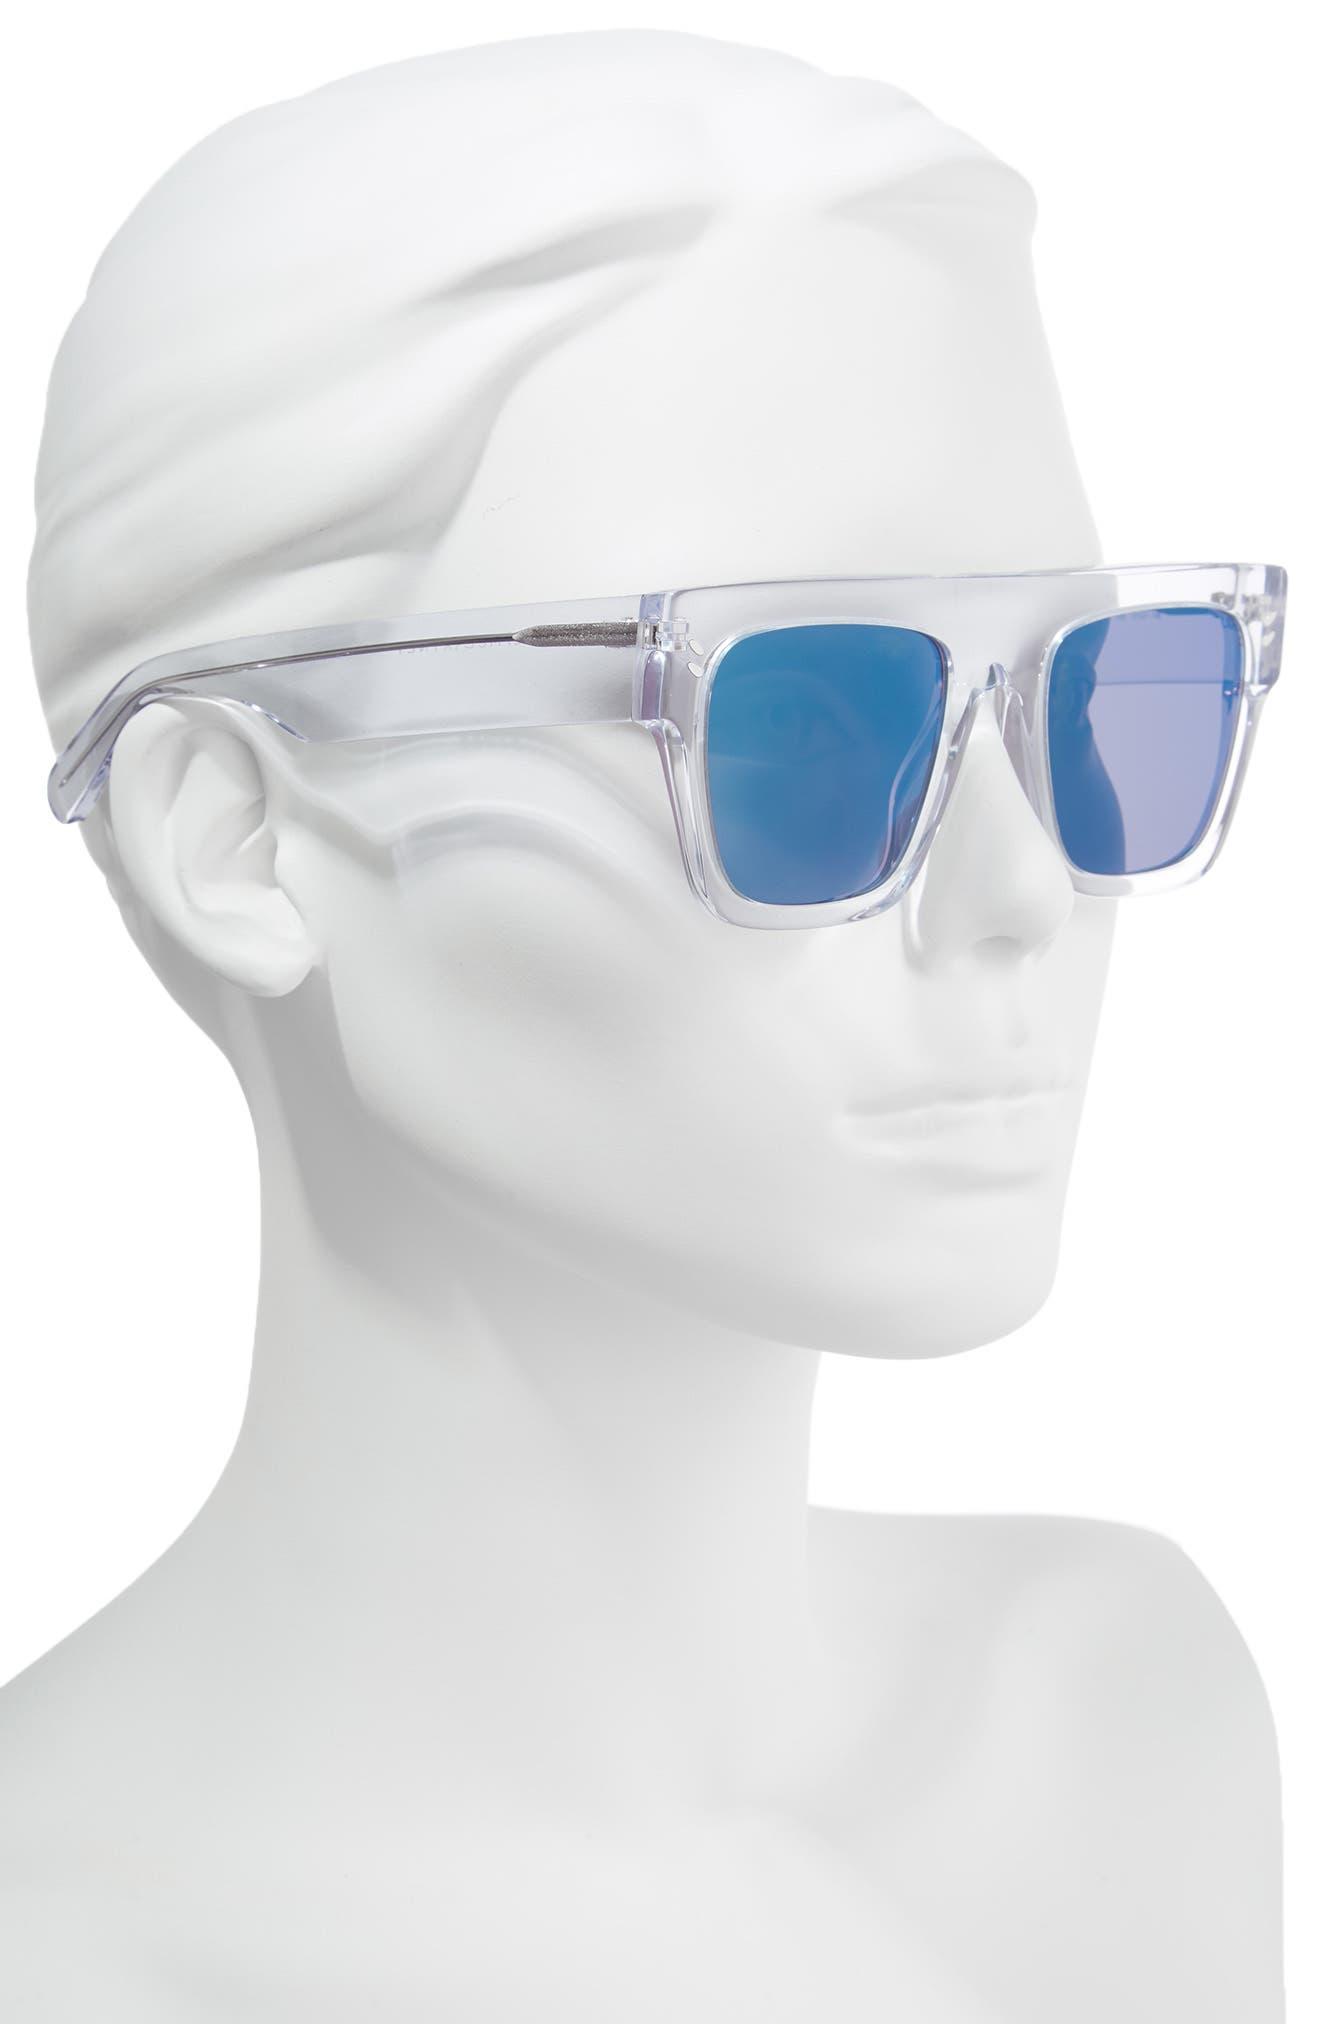 51mm Flattop Sunglasses,                             Alternate thumbnail 2, color,                             Crystal